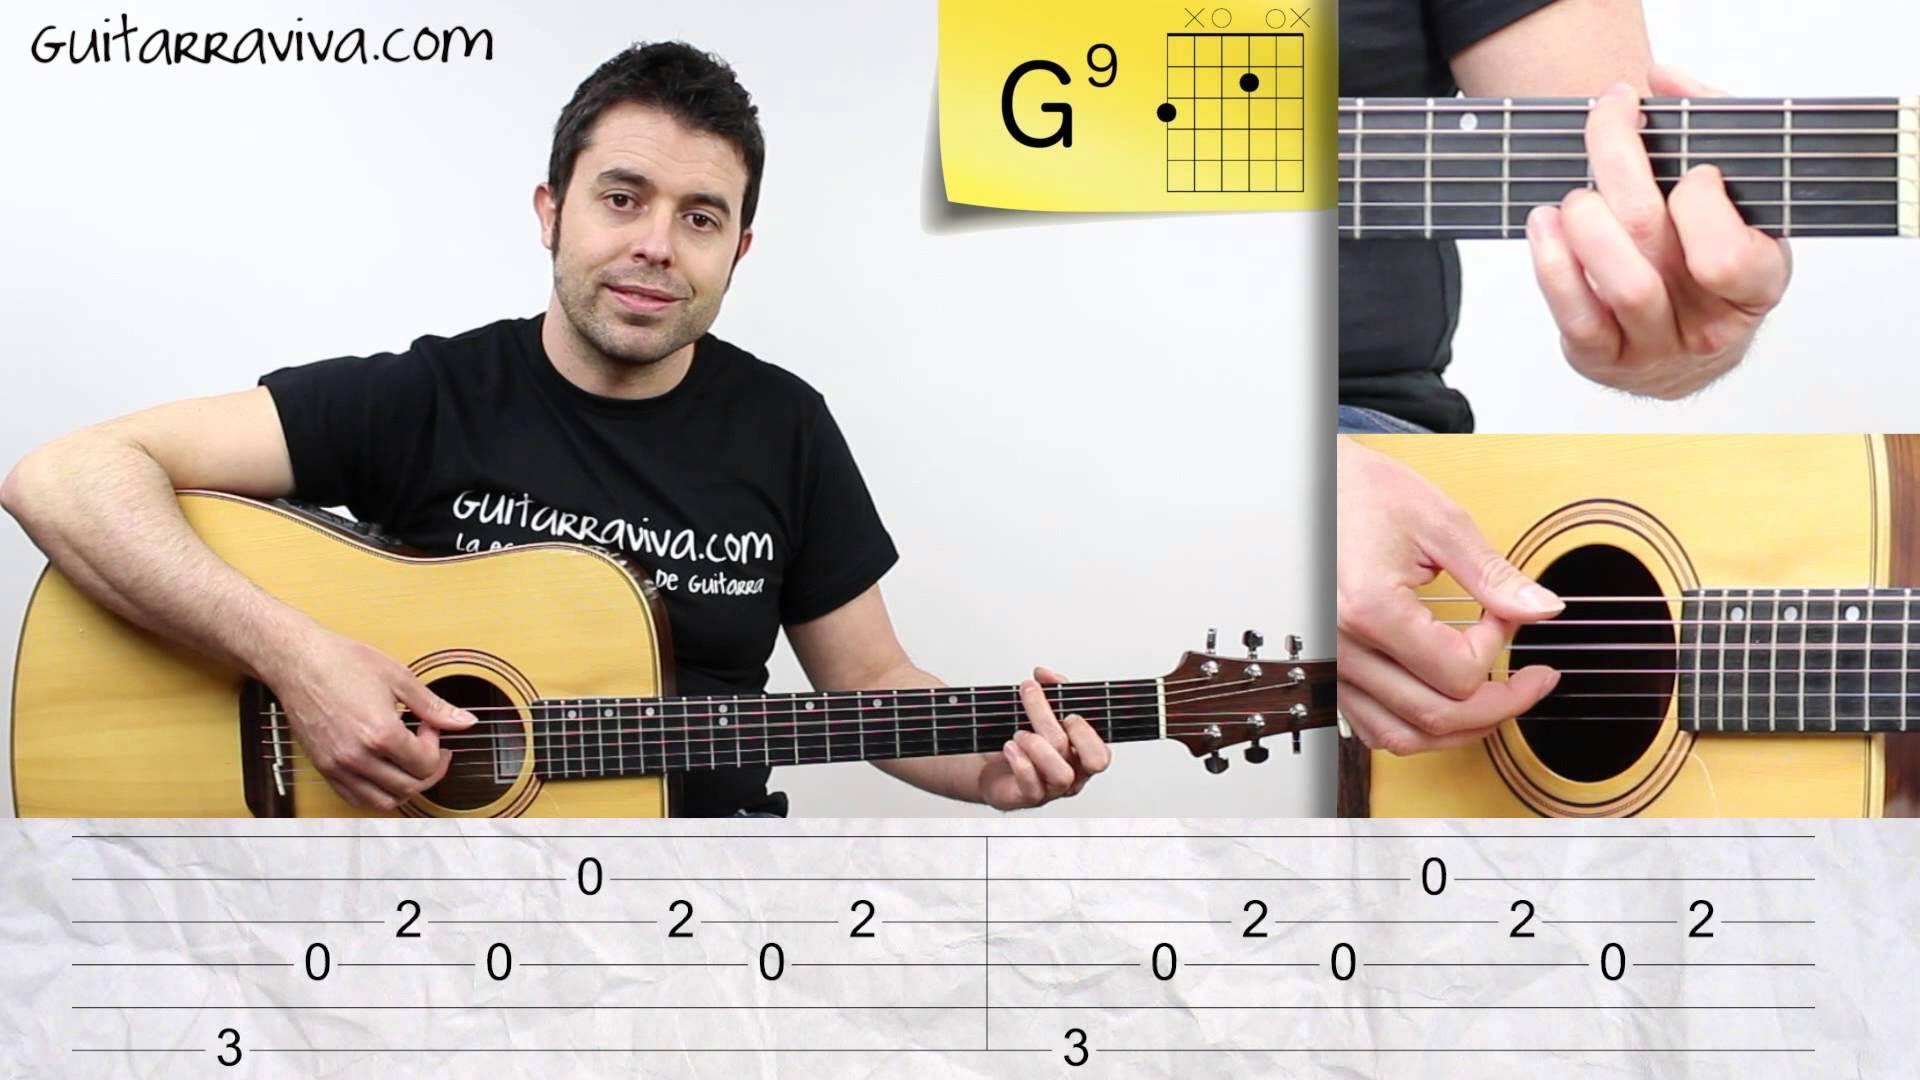 Como Tocar Every Breath You Take En Fingerpicking Arpegios Learn Guitar Guitar Music